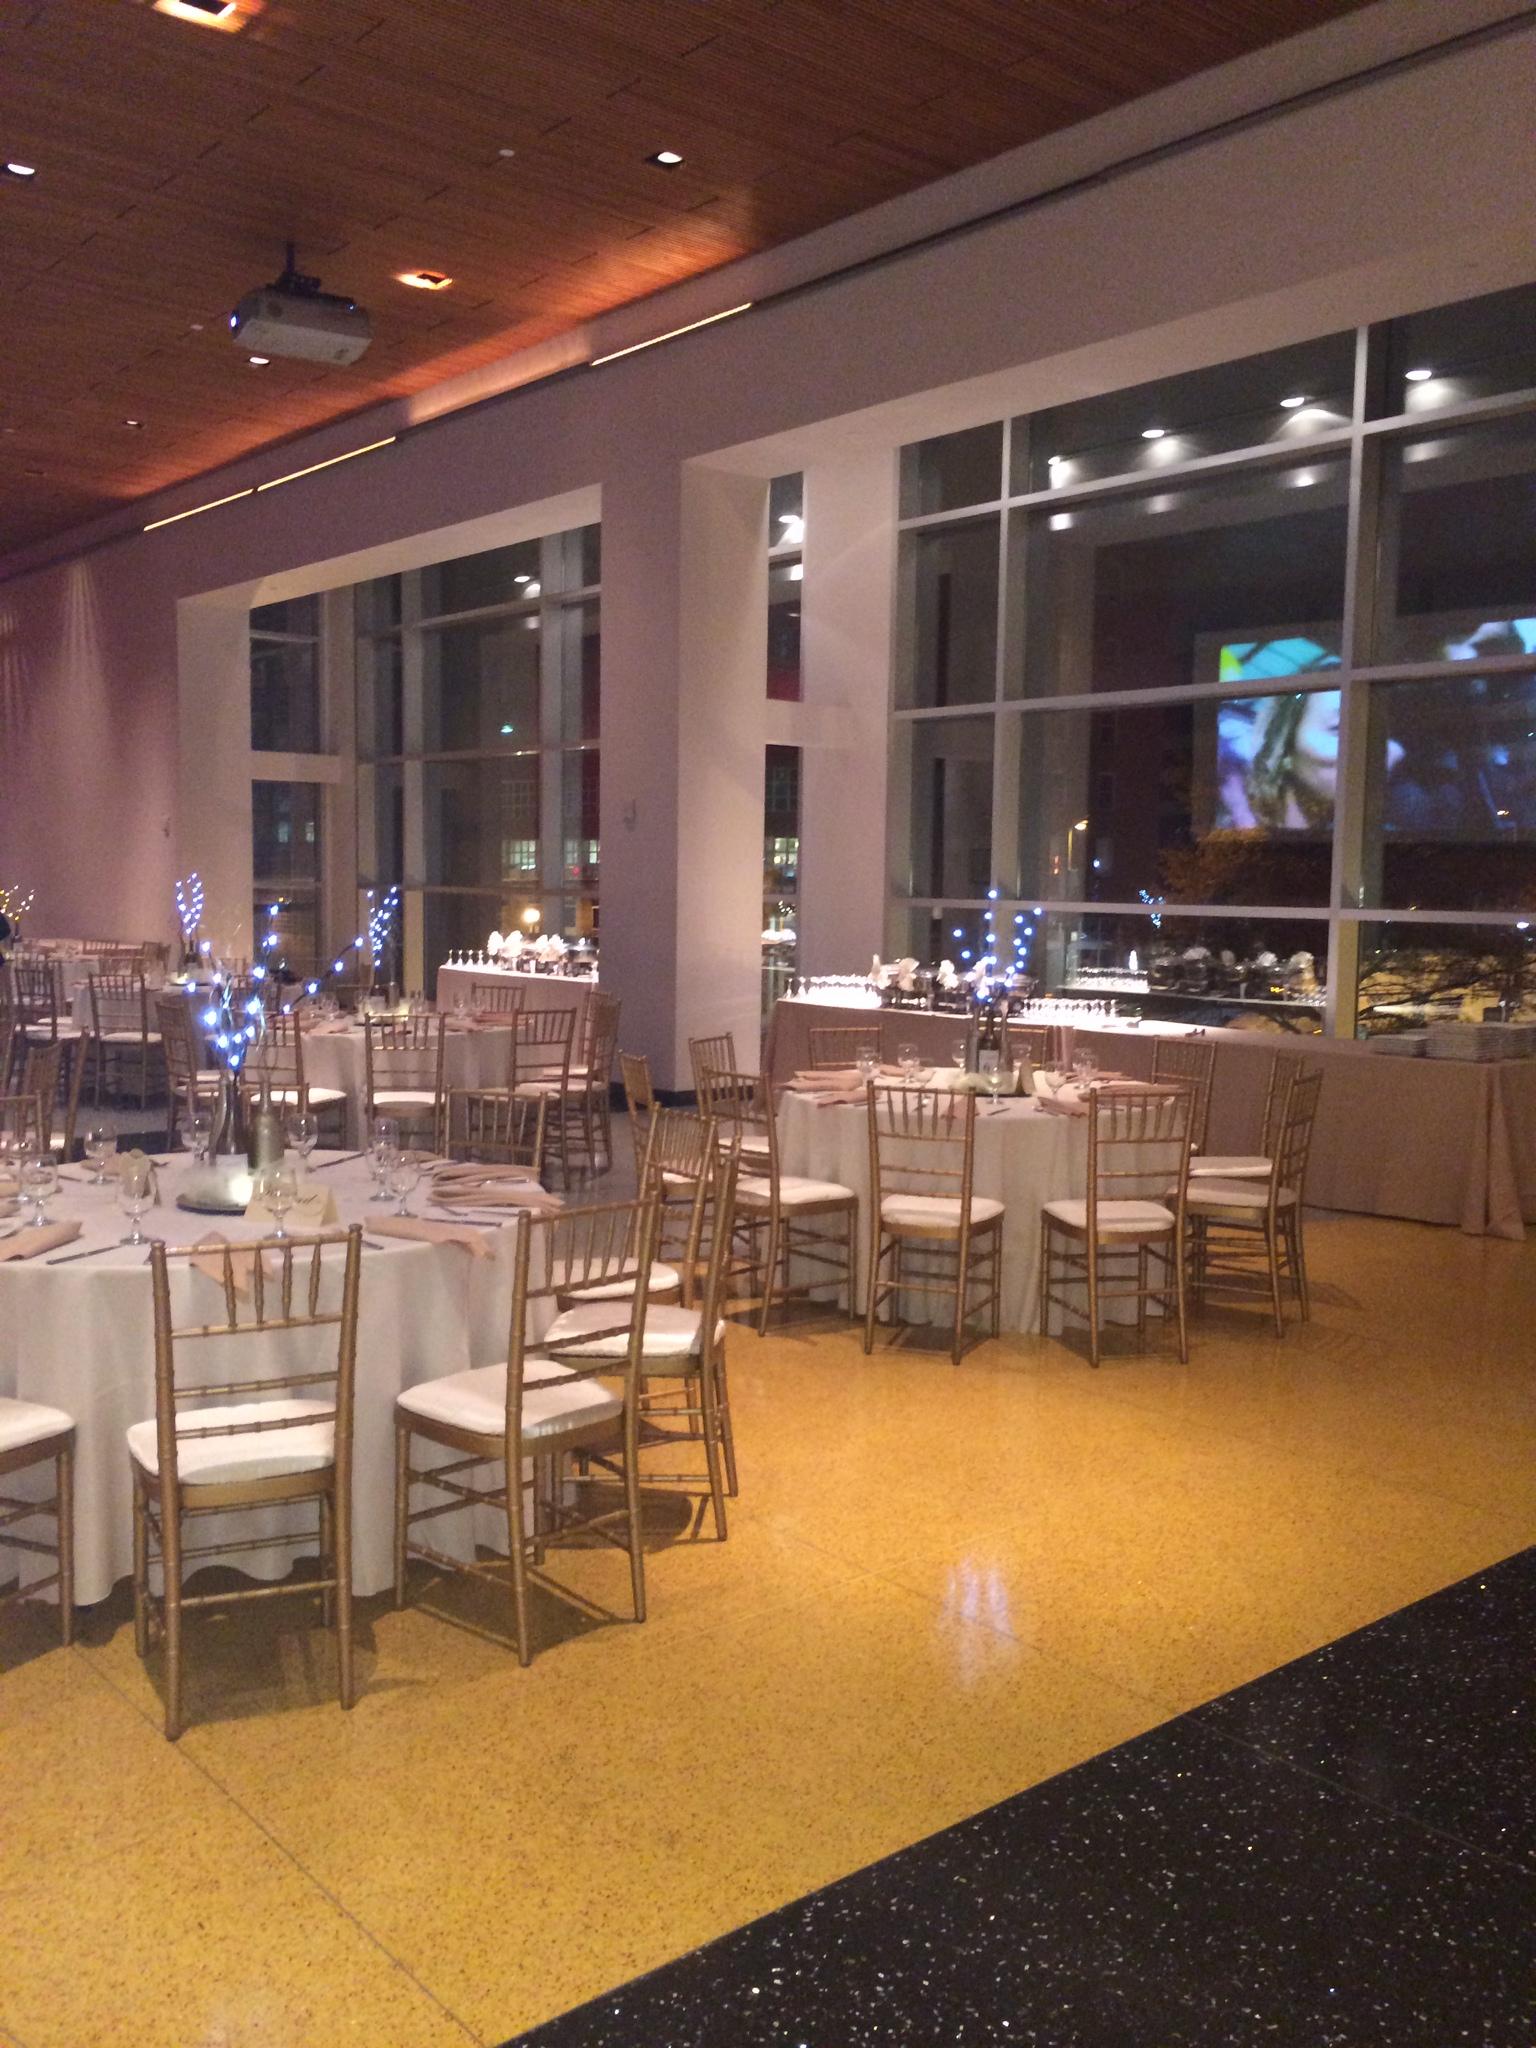 reginald f lewis museum wedding venue in baltimore partyspace. Black Bedroom Furniture Sets. Home Design Ideas